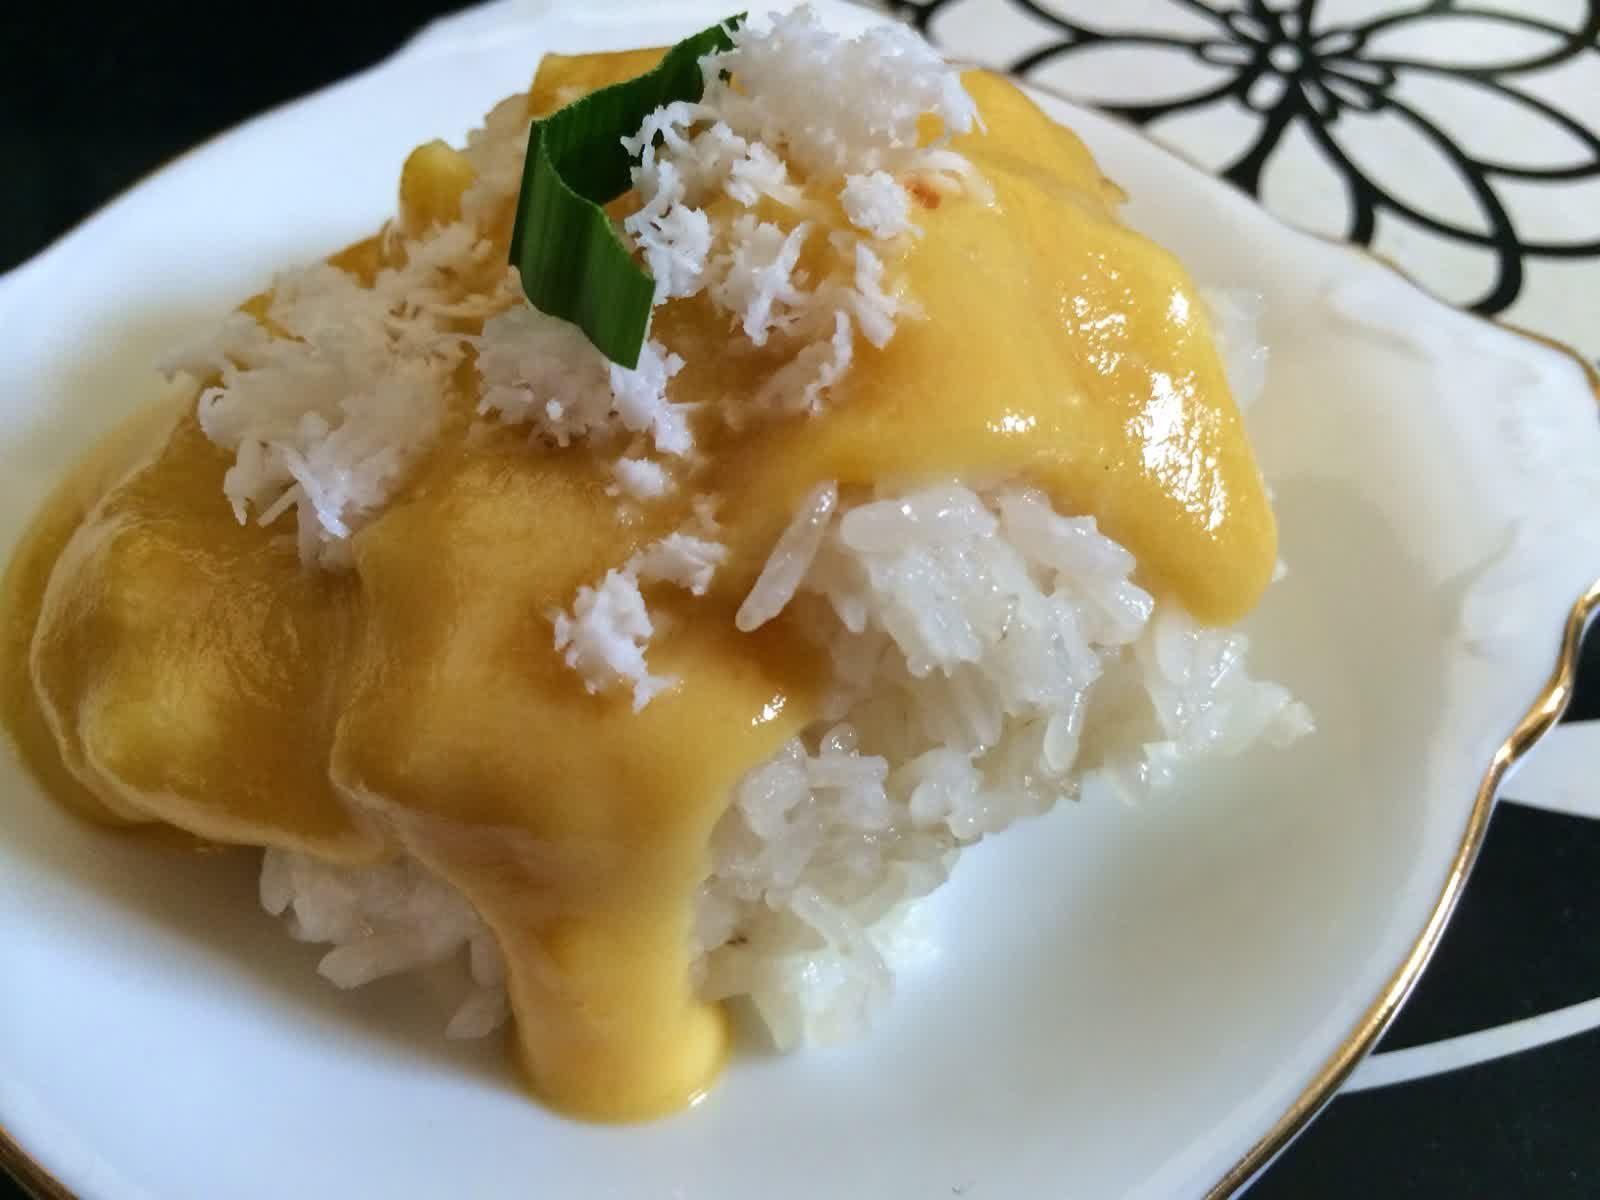 Musim Durian, Coba 8 Resep Olahan Durian yang Bikin Nagih - Resep